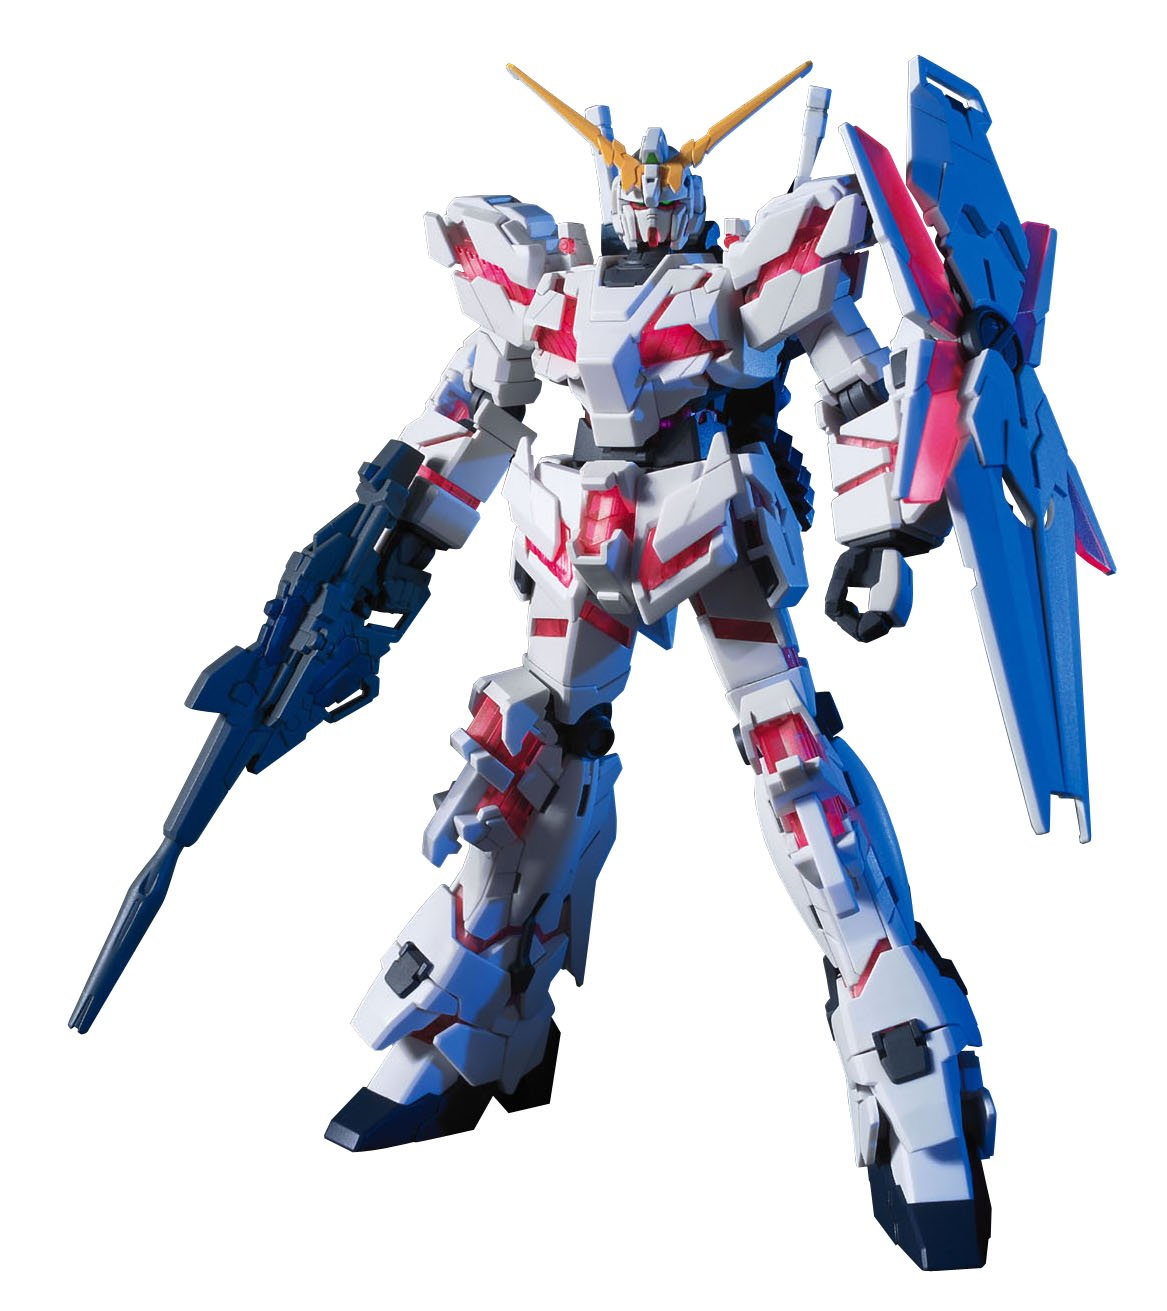 Bandai HGUC Action Figure Bandai Hobby #100 RX-0 UNICORN GUNDAM Destroy Mode